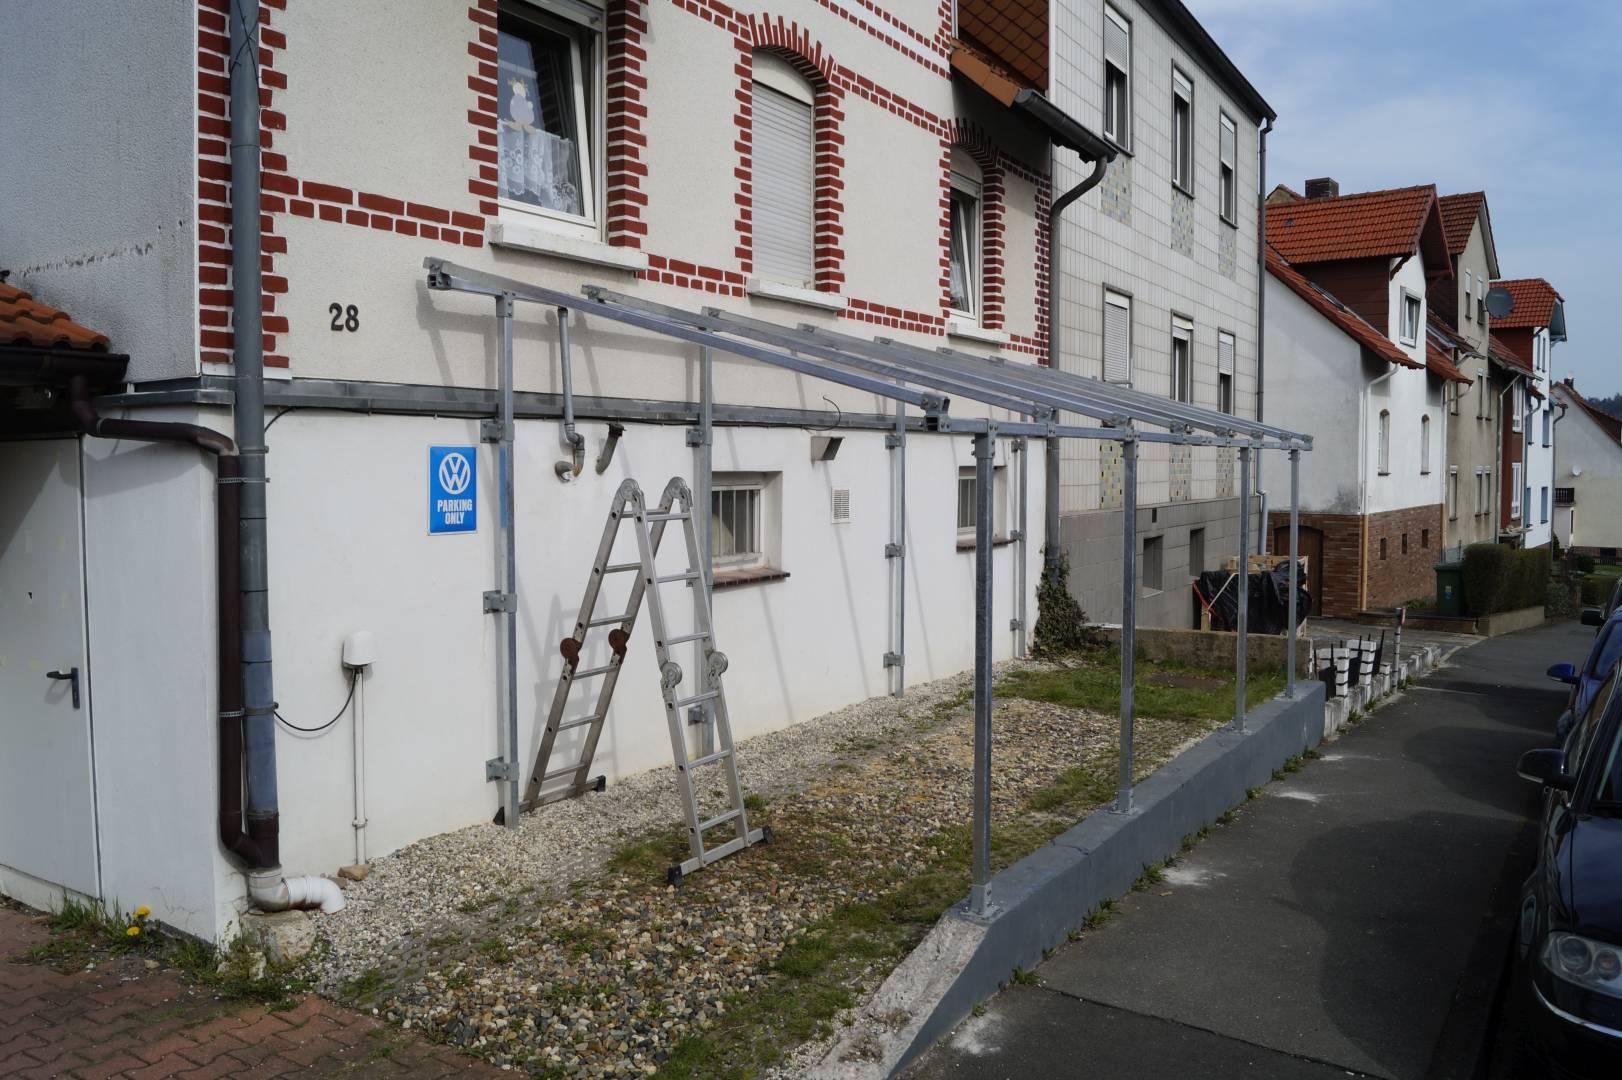 Carport_Aufbau_C02.jpg